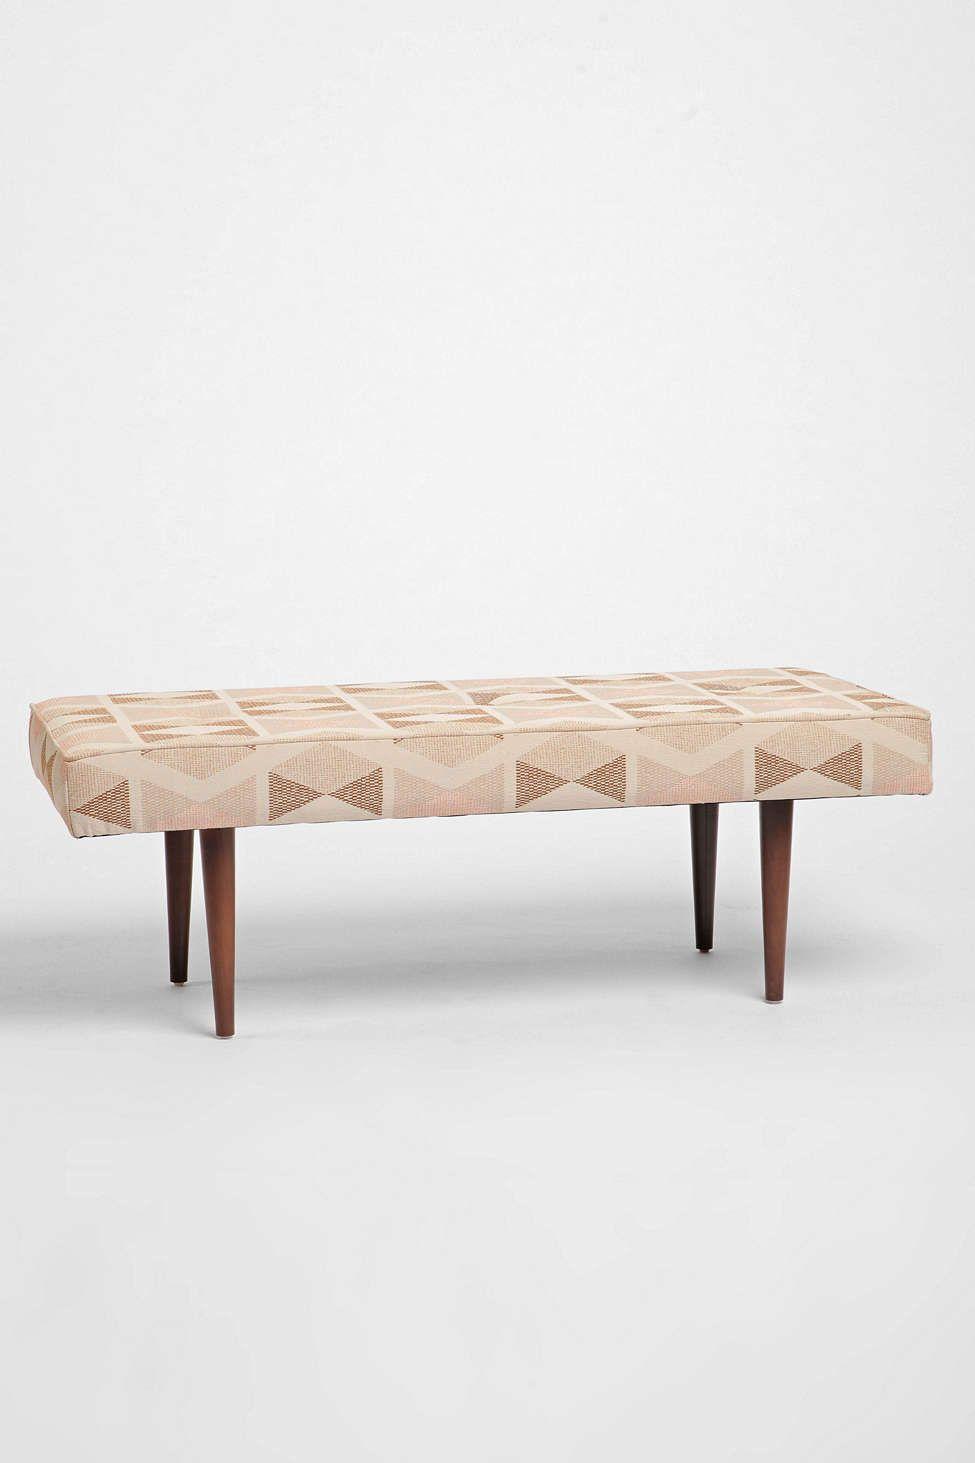 Stupendous Henderson Printed Upholstered Bench Scandinavian Style Ibusinesslaw Wood Chair Design Ideas Ibusinesslaworg